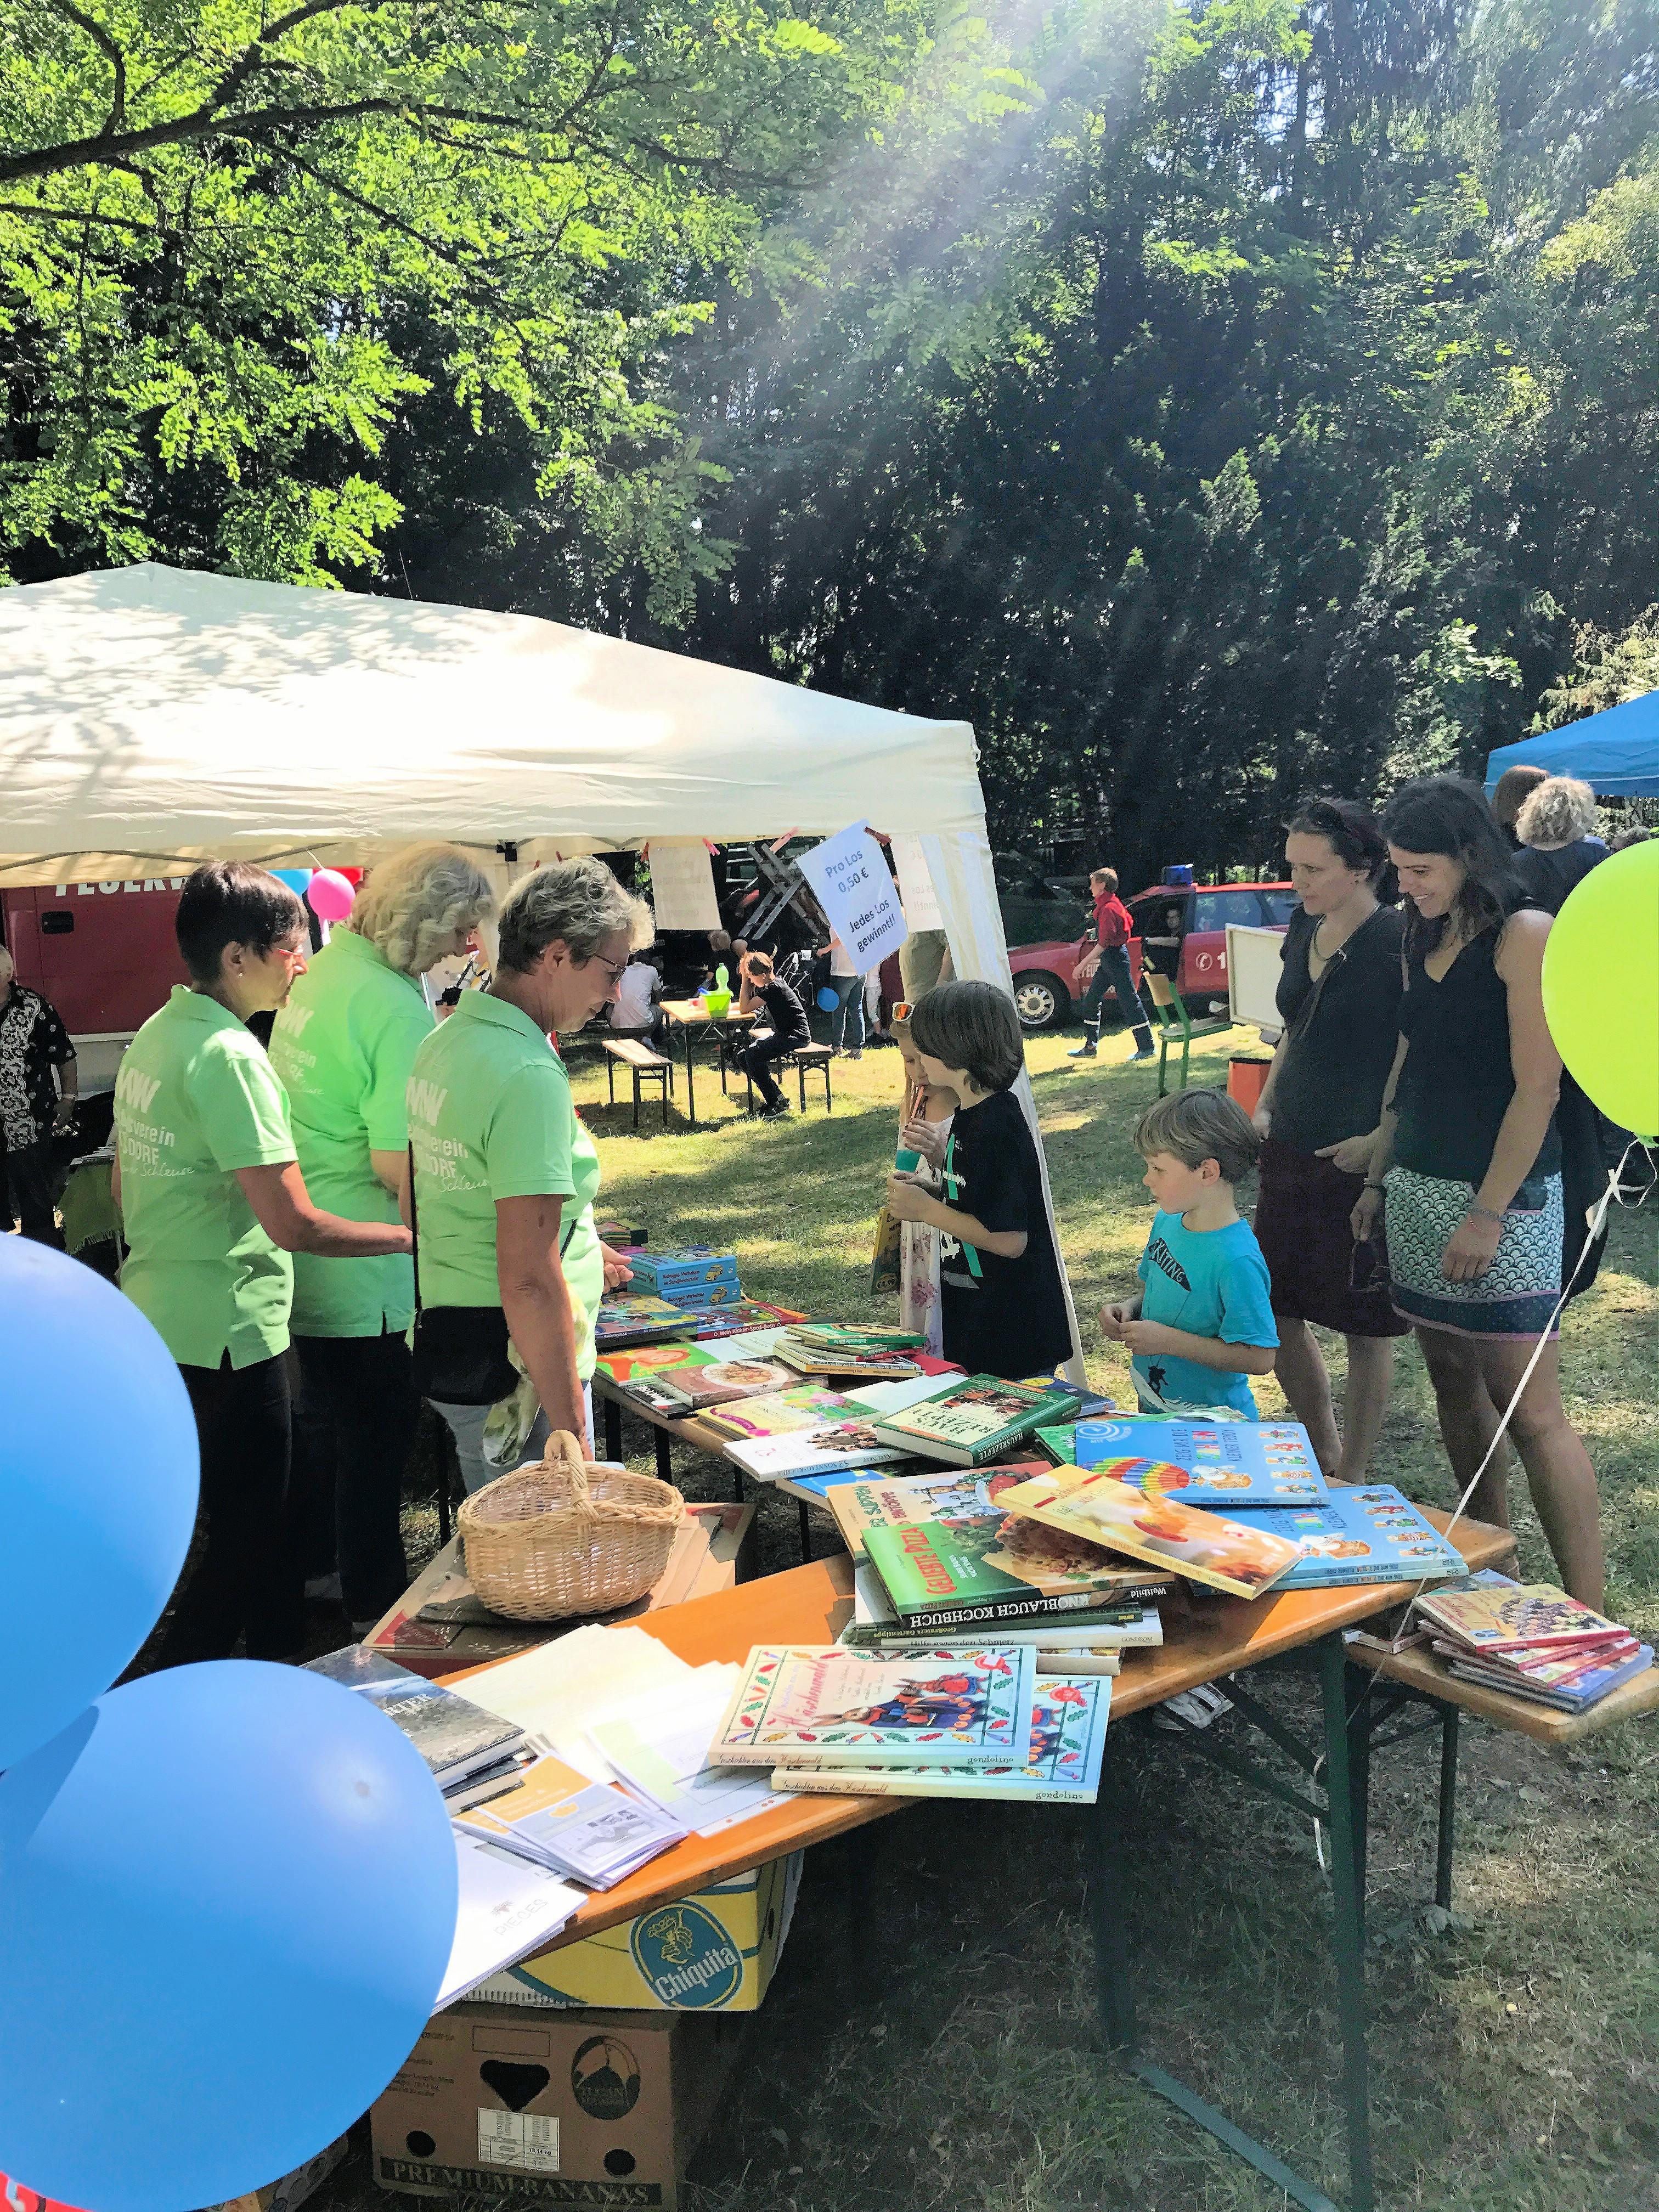 09.07.2017 Bunte MVW-Tombola zum Woltersdorfer Sommerfest